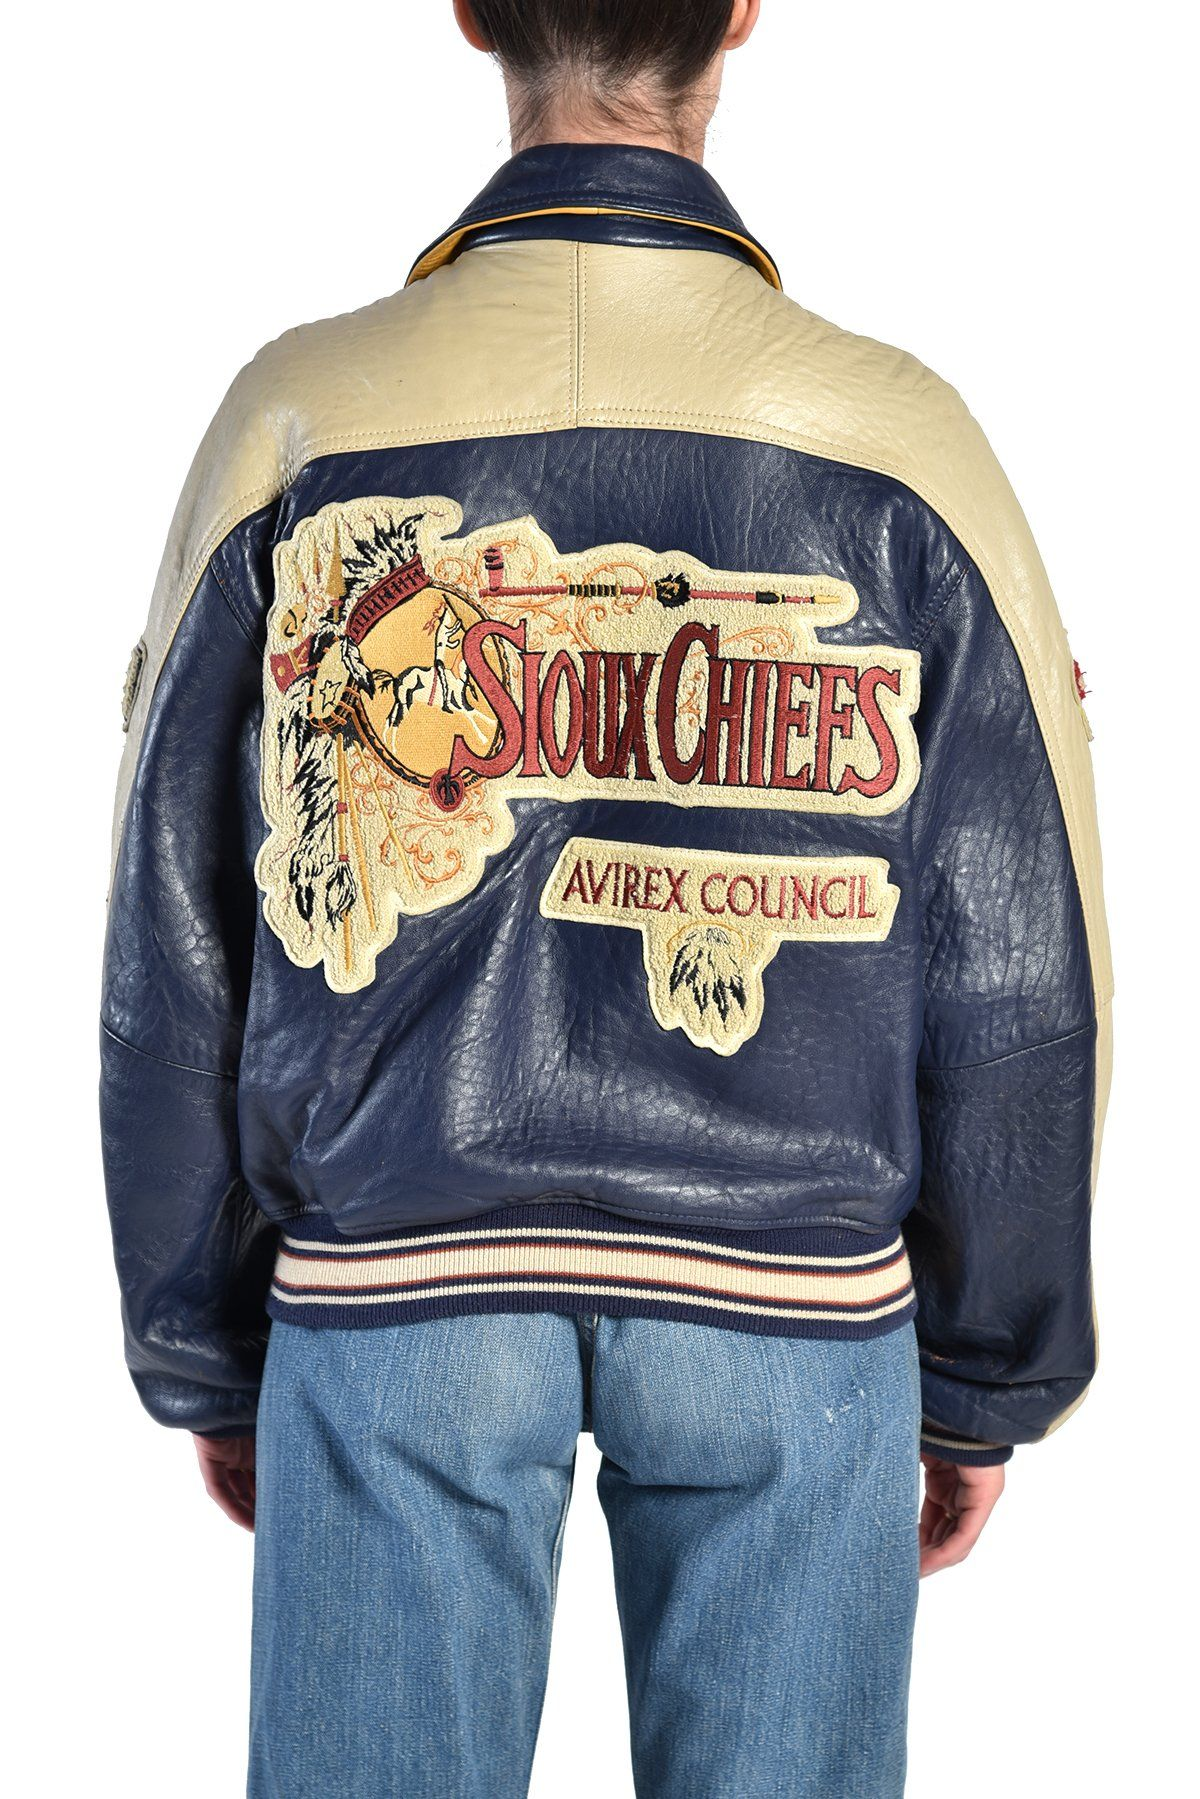 Molina Sioux Chiefs Leather Baseball Jacket Bustown Modern Leather Baseball Jacket Baseball Jacket Leather Varsity Jackets [ 1799 x 1200 Pixel ]